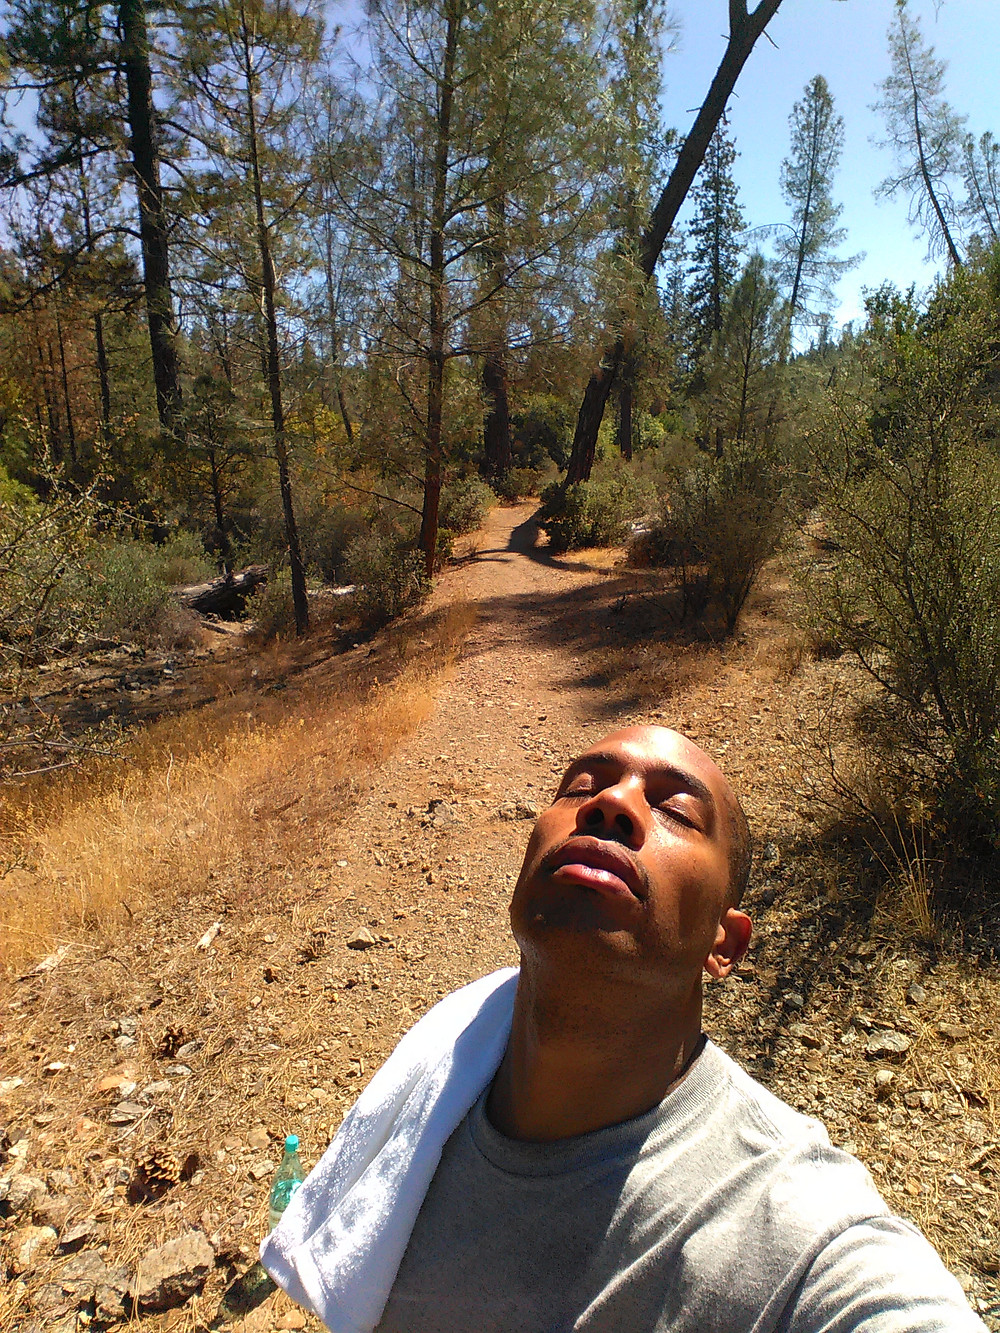 Out in nature in Eldarado Ca